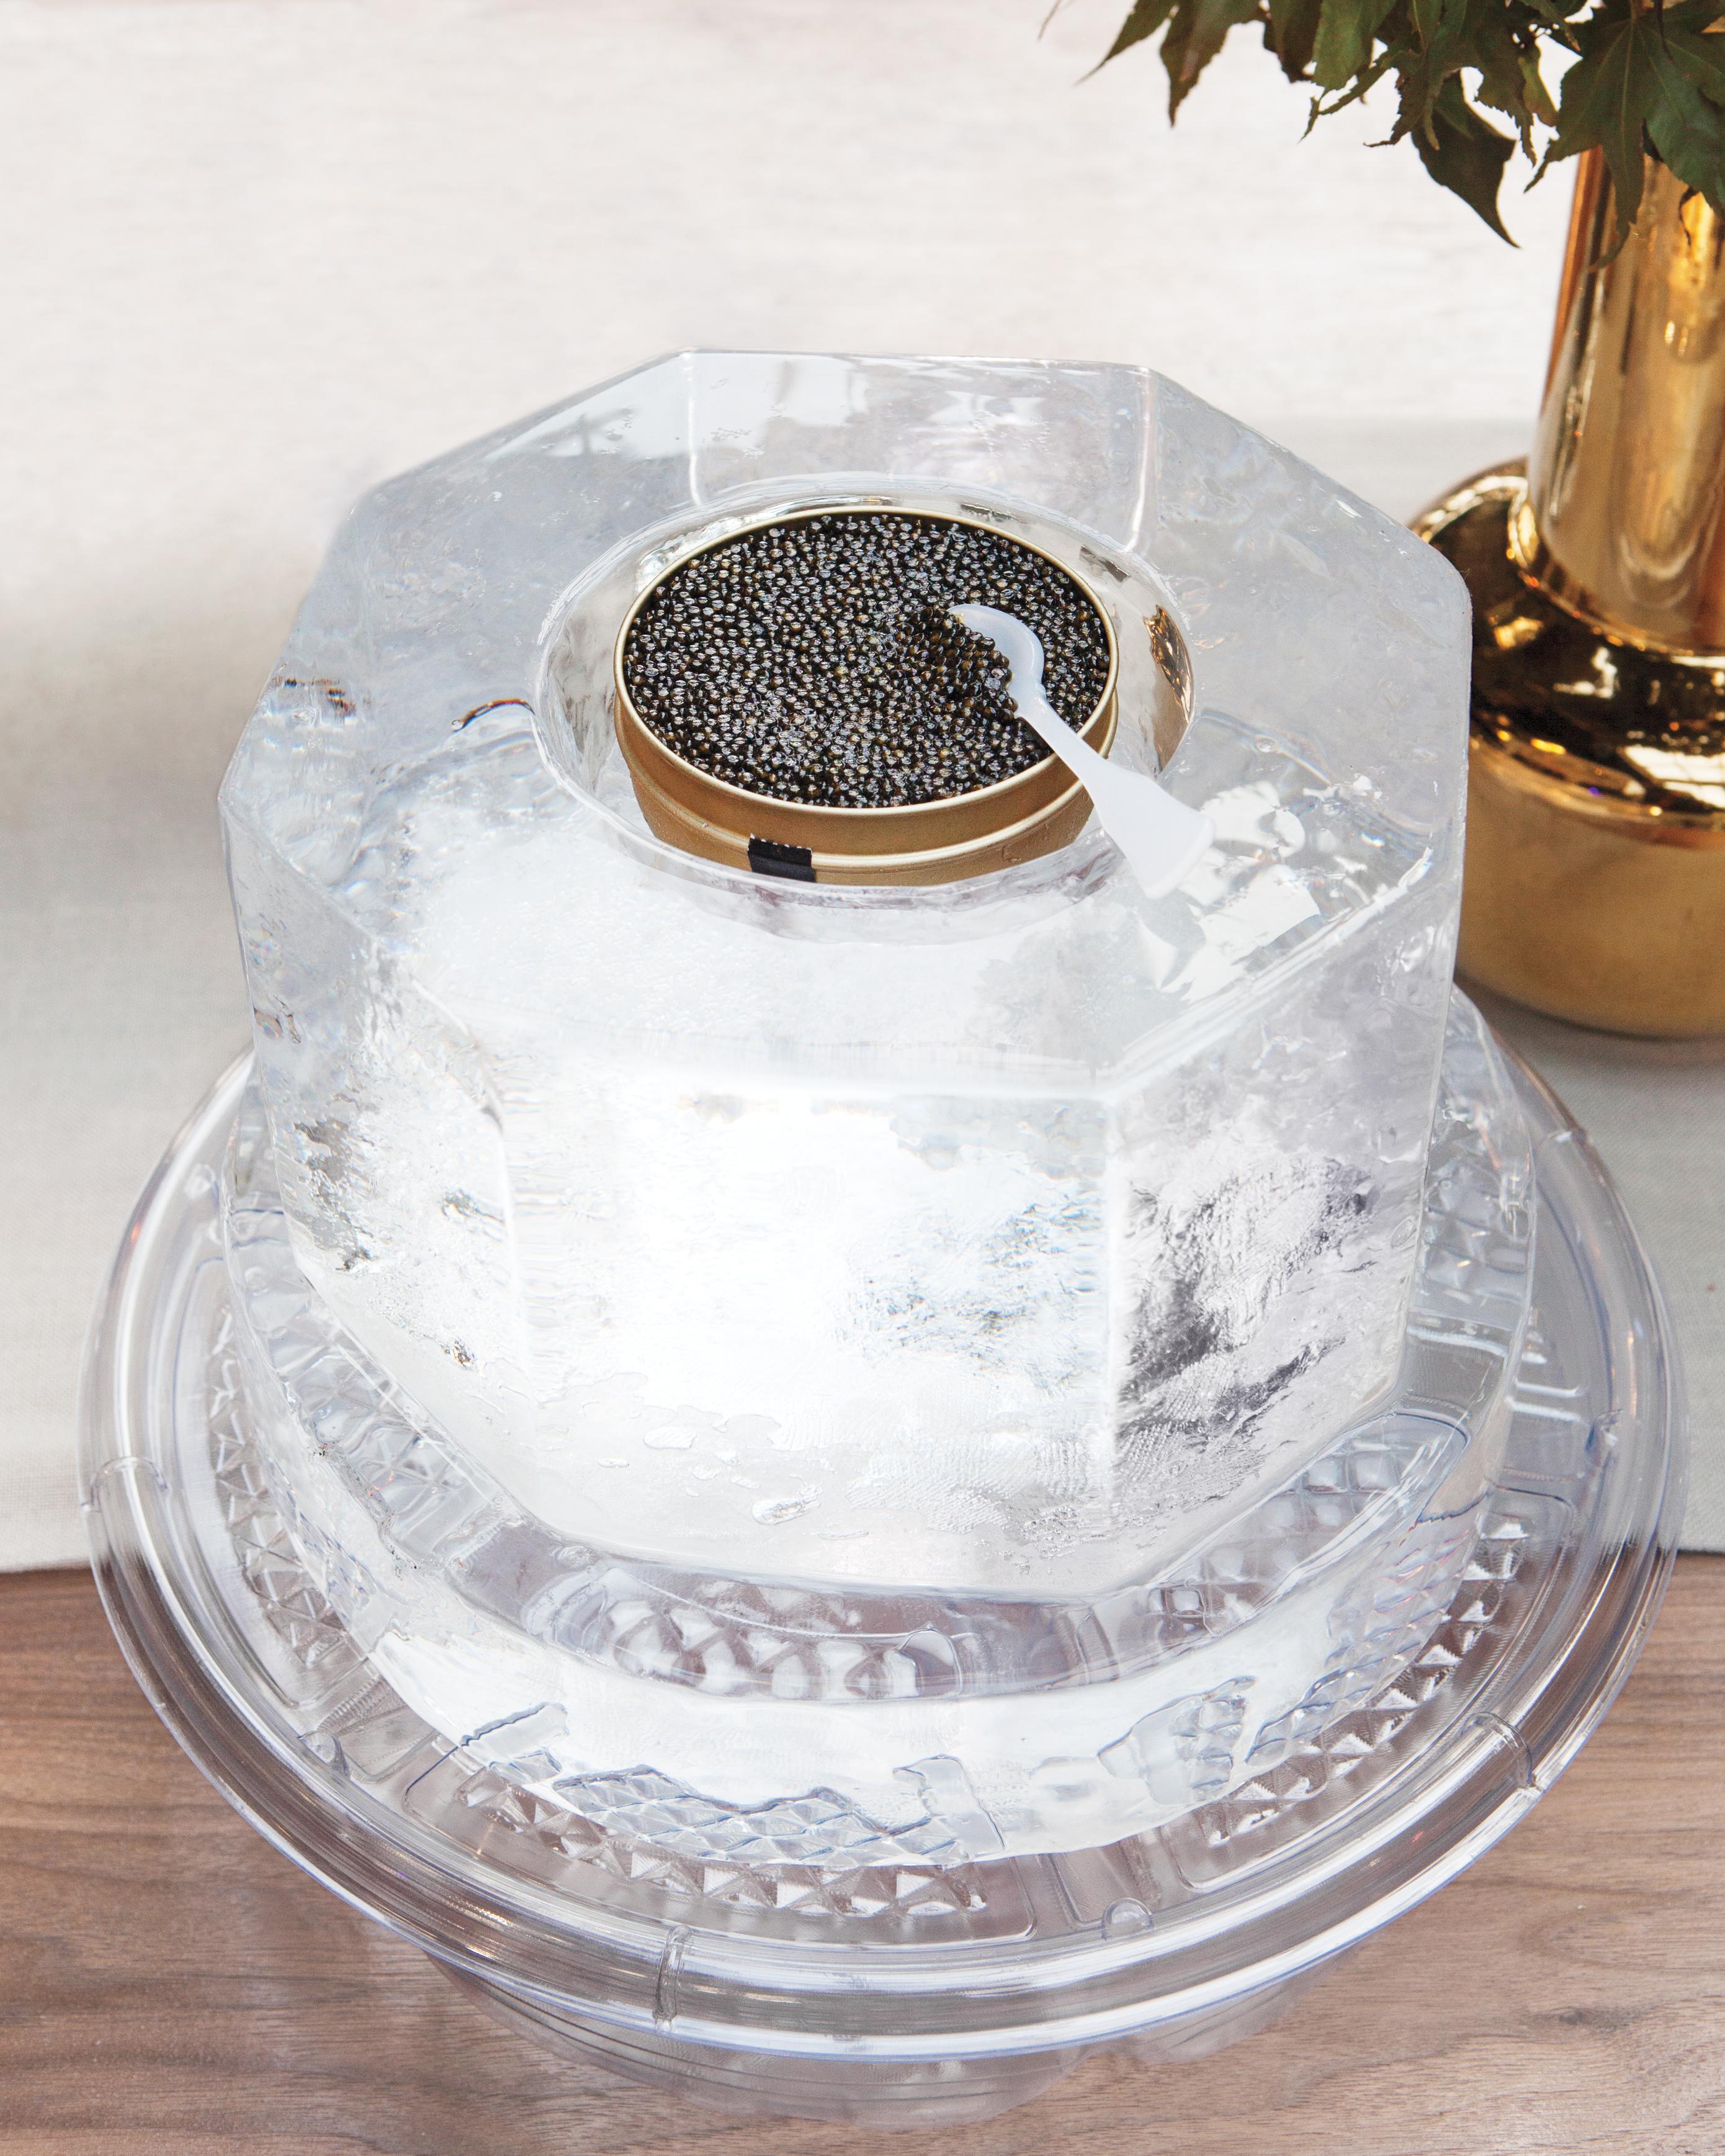 anthony-rusty-wedding-caviar-8390-mwd110751-0914.jpg